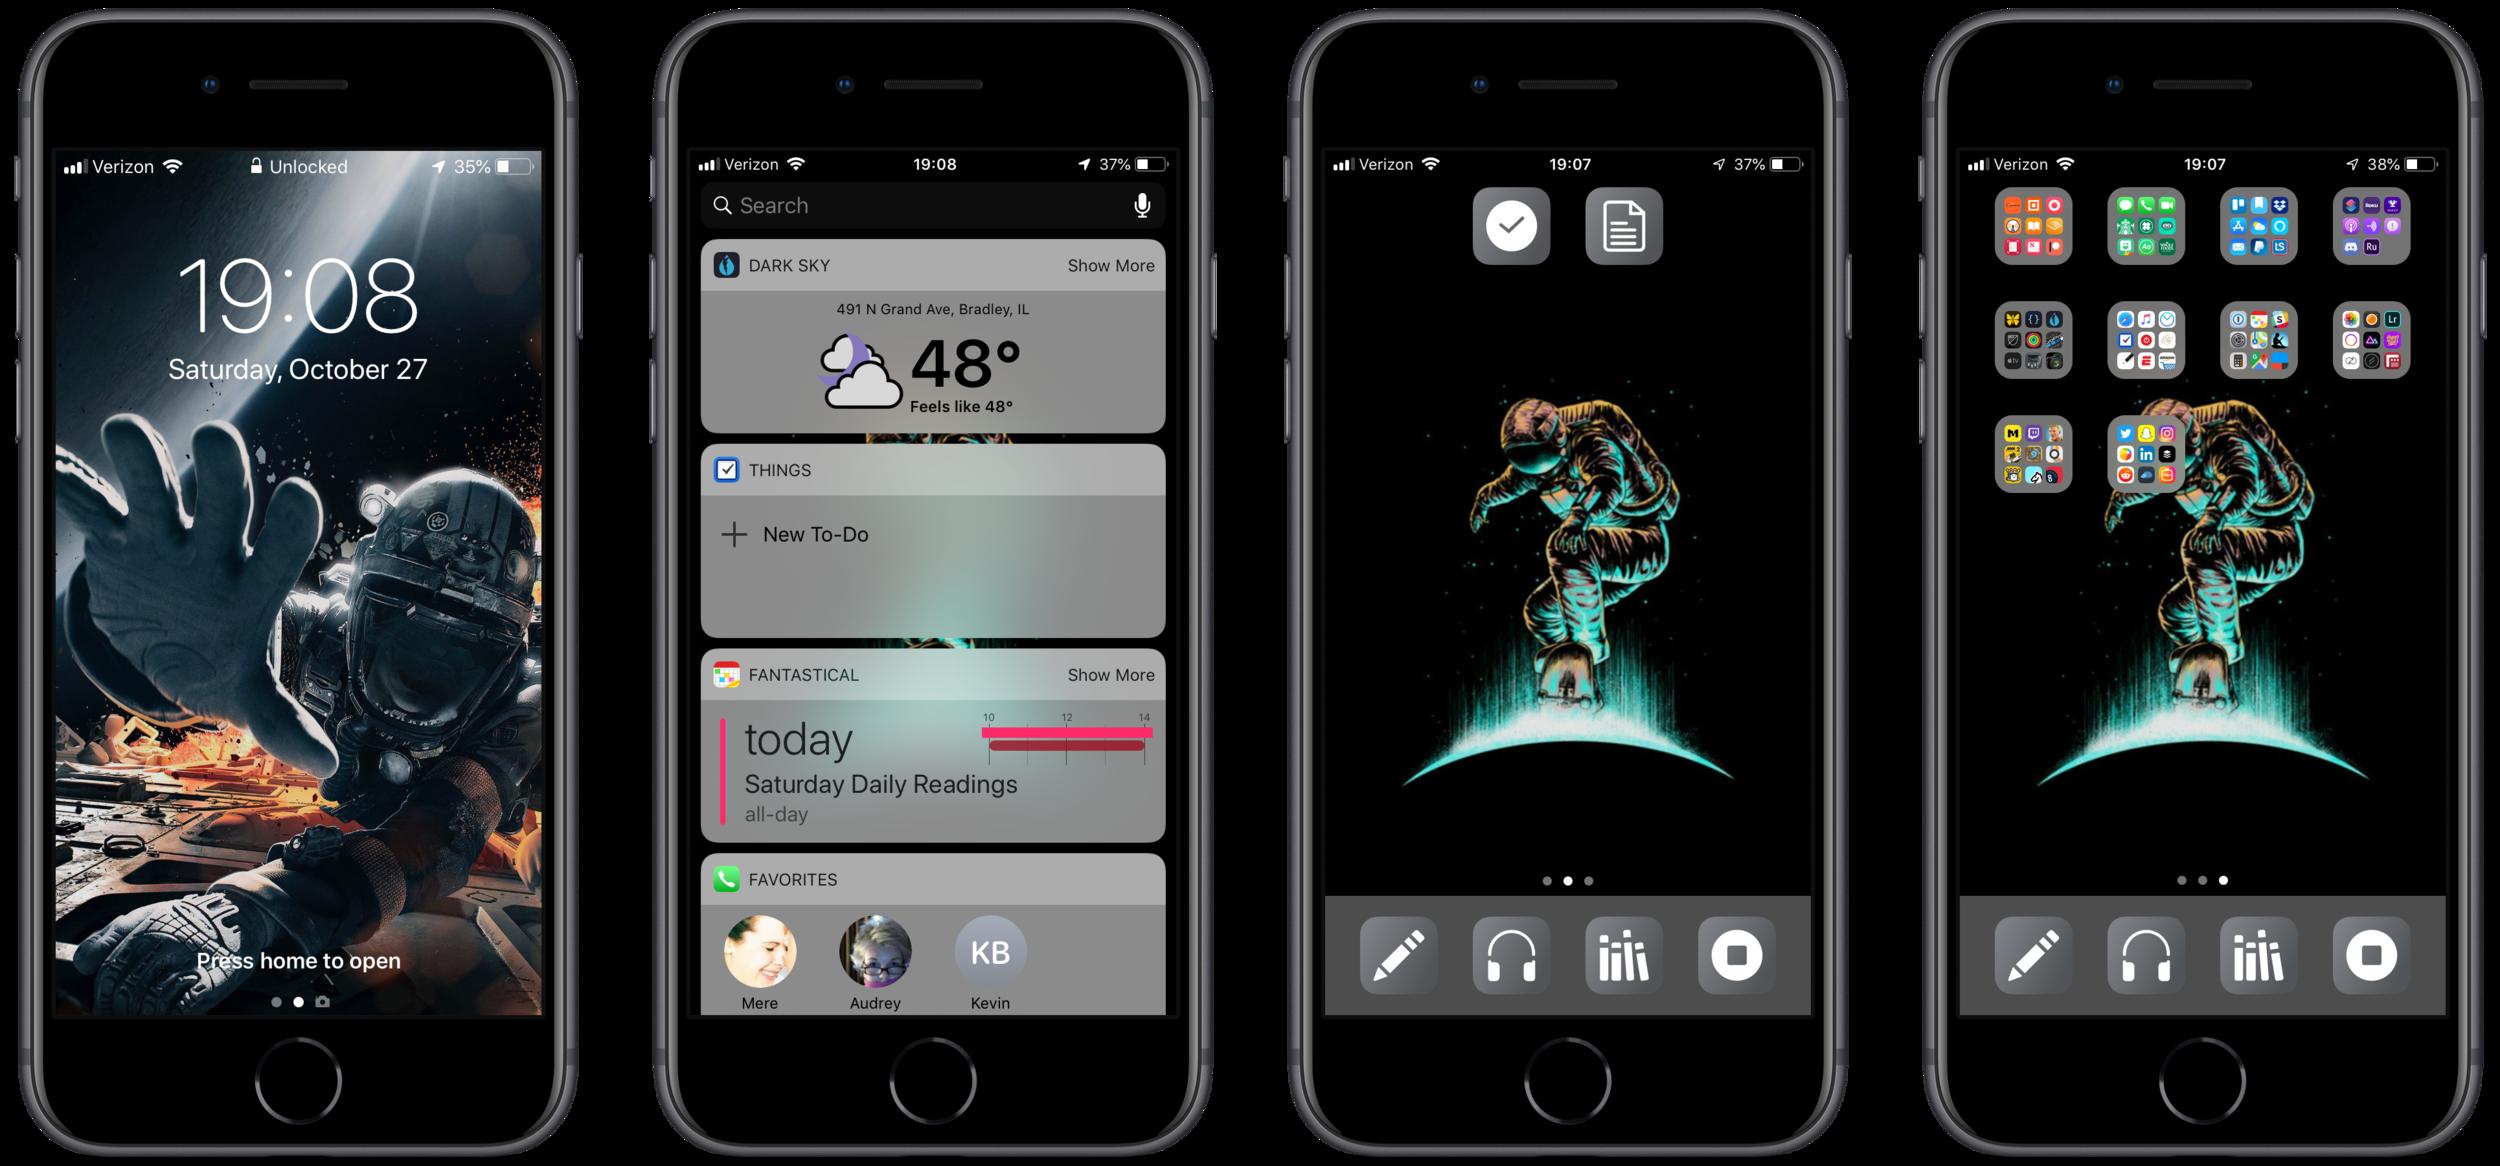 Lock Screen, Widget Screen, Home Screen, Secondary Screen